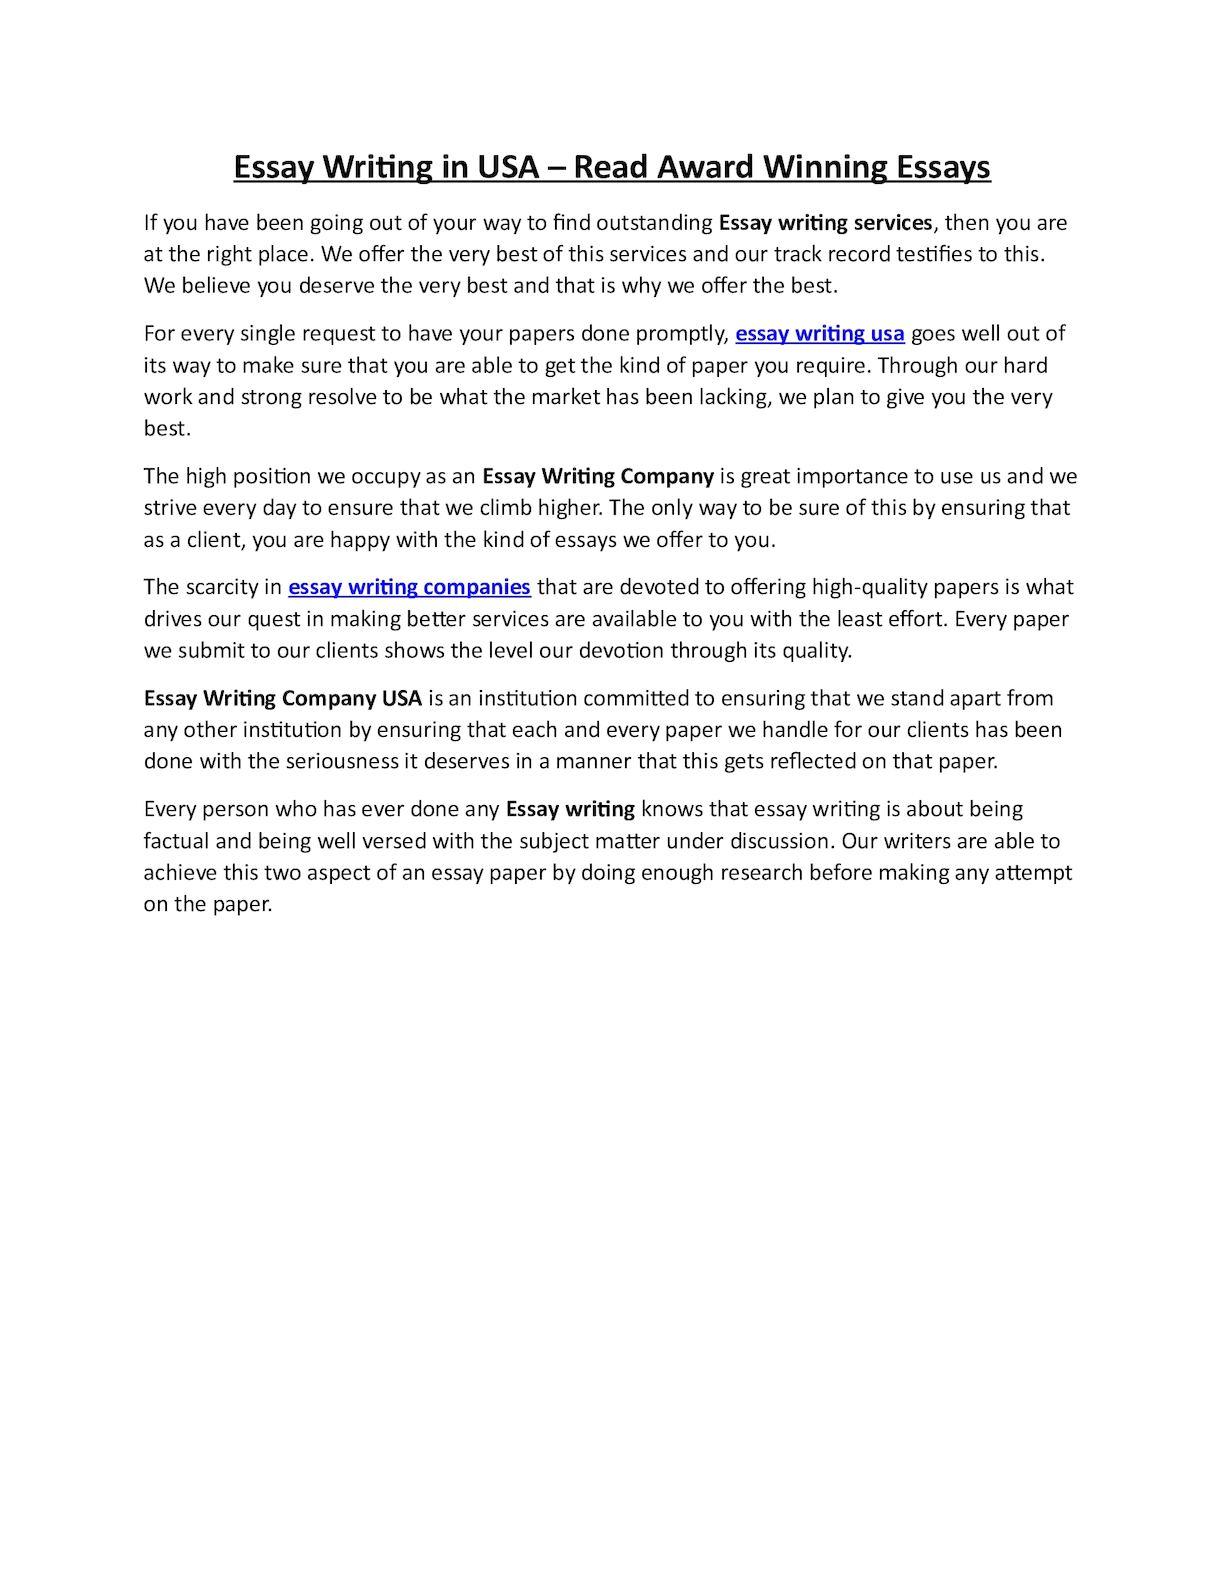 Best essays writing services us essays evil